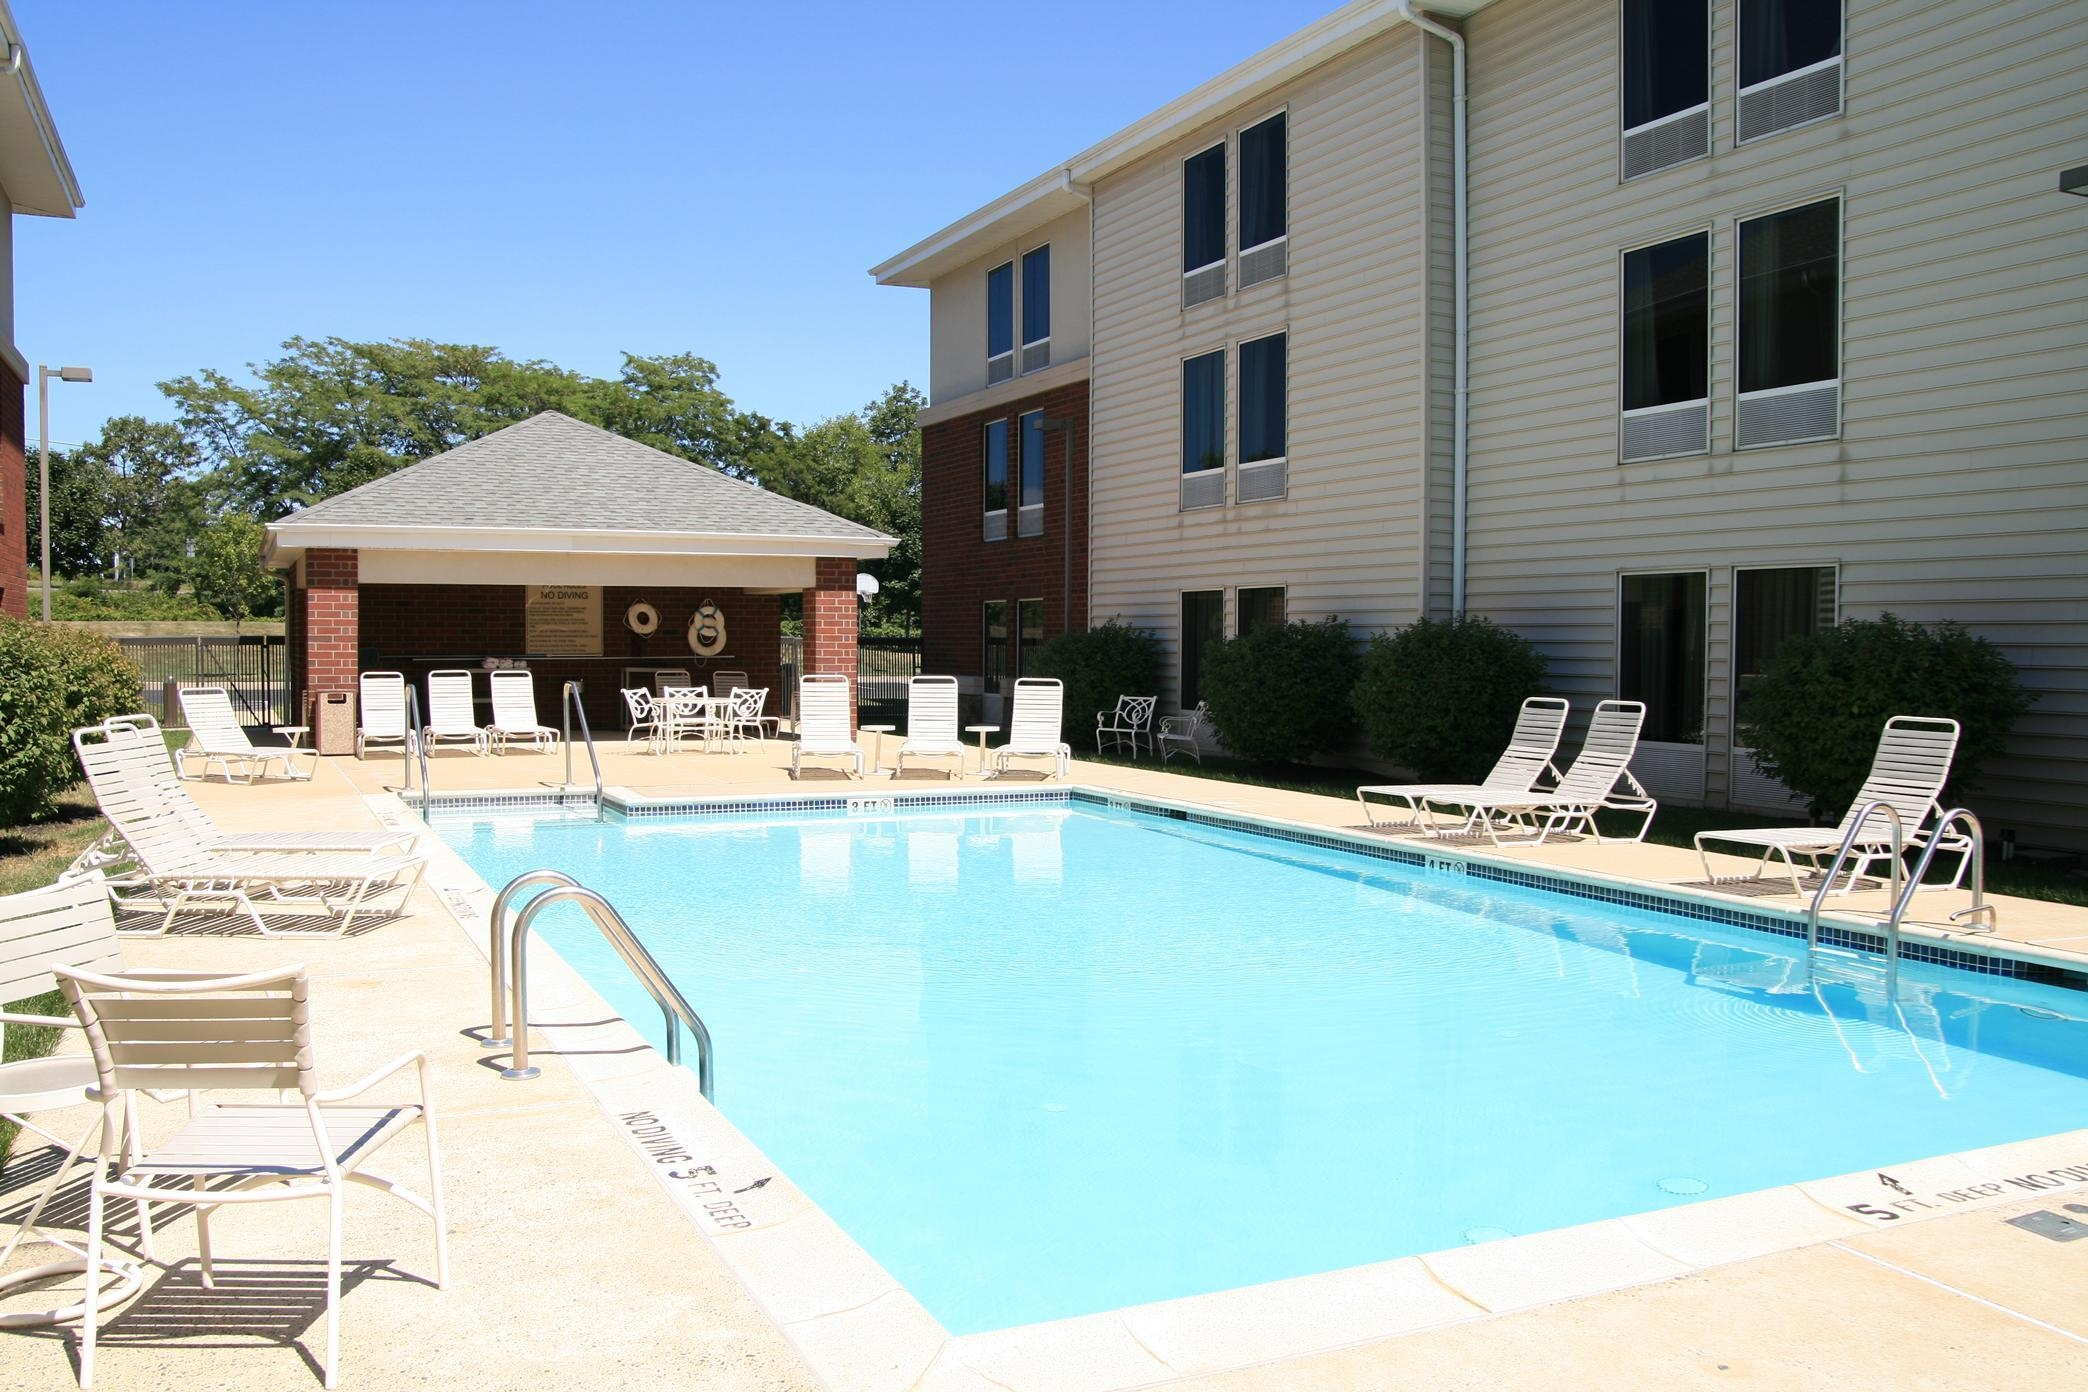 Hampton Inn & Suites Newtown image 8